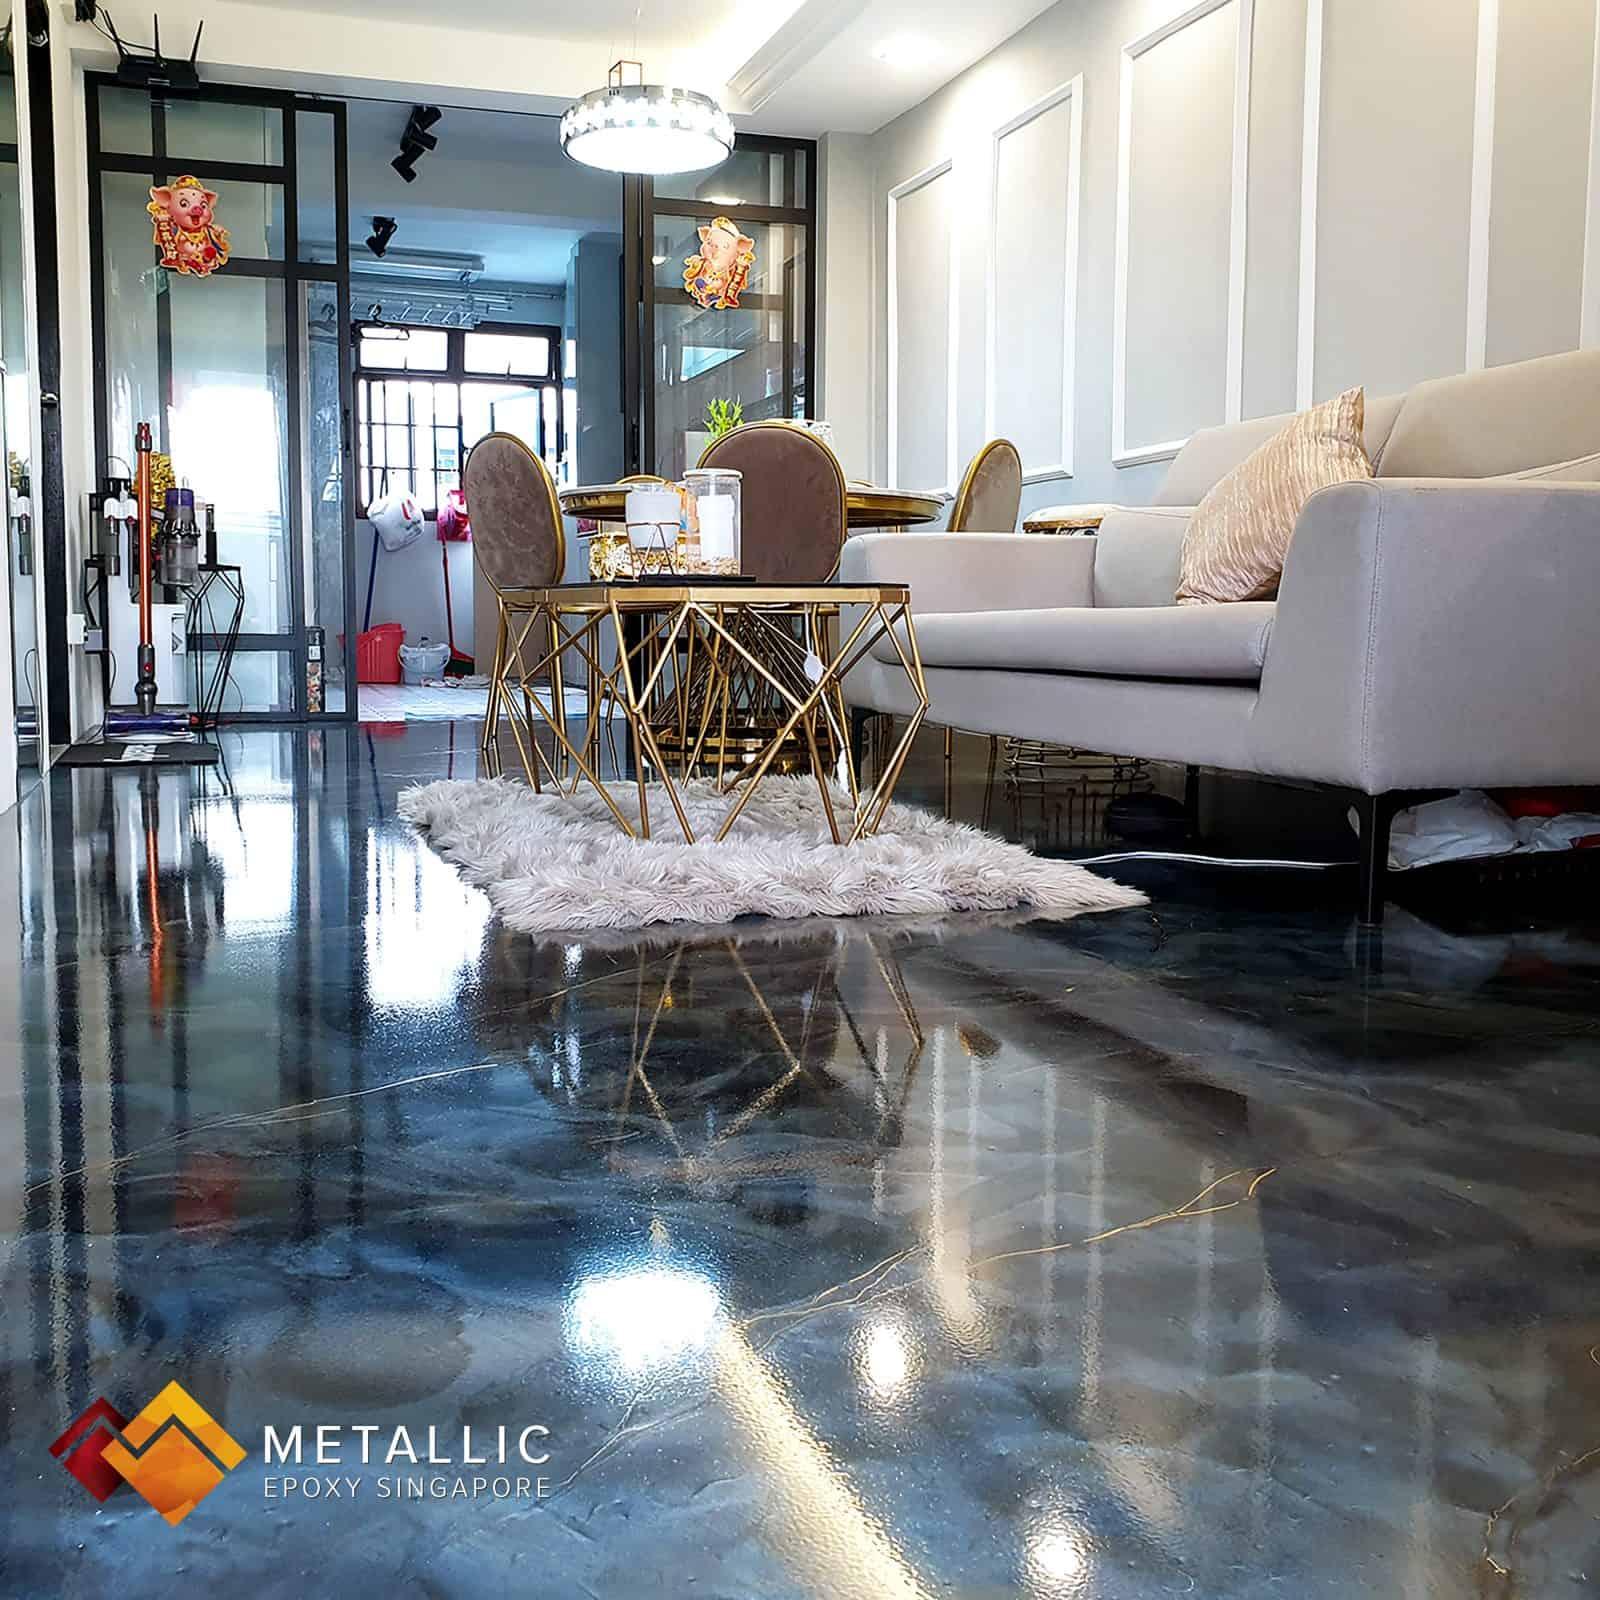 galaxy metallic epoxy singapore floor